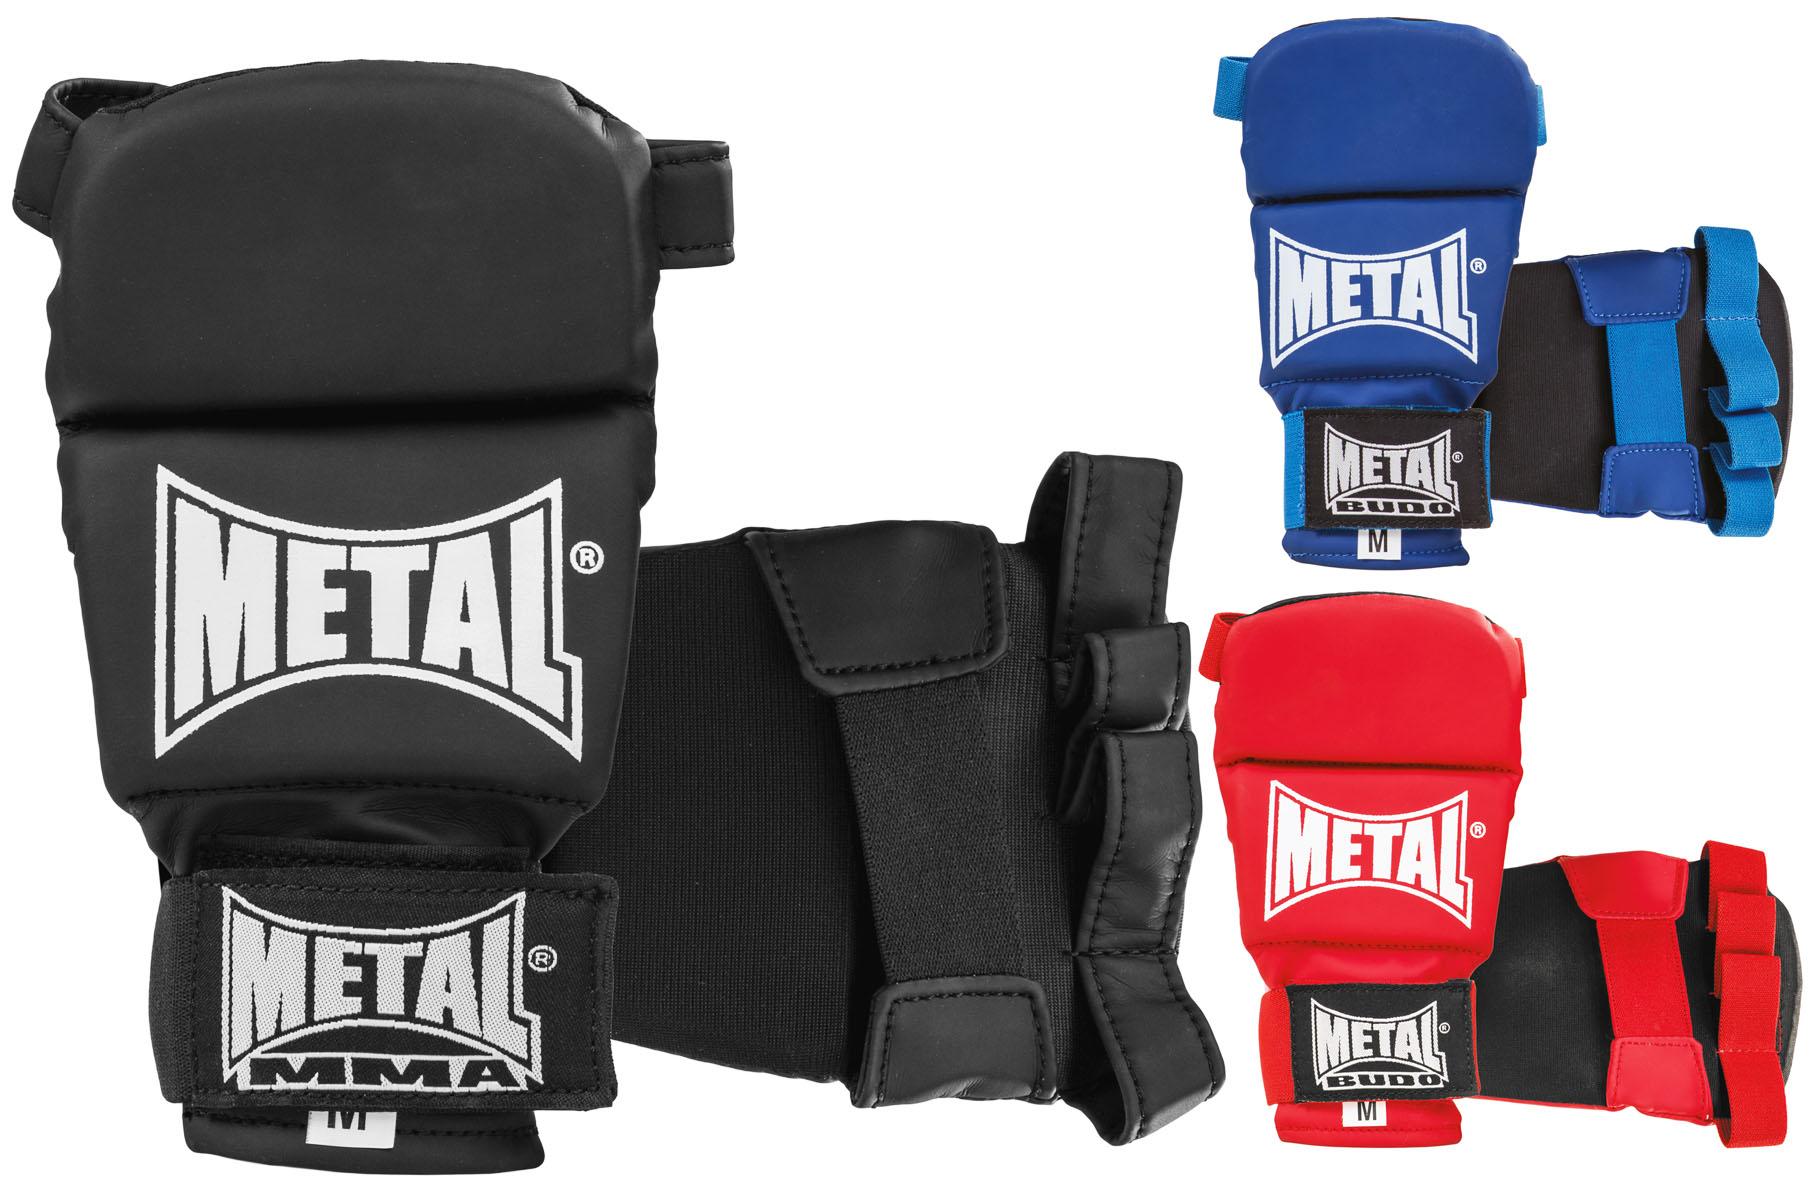 Gants Initiation MMA, Ju Jitsu, Metal Boxe MB488